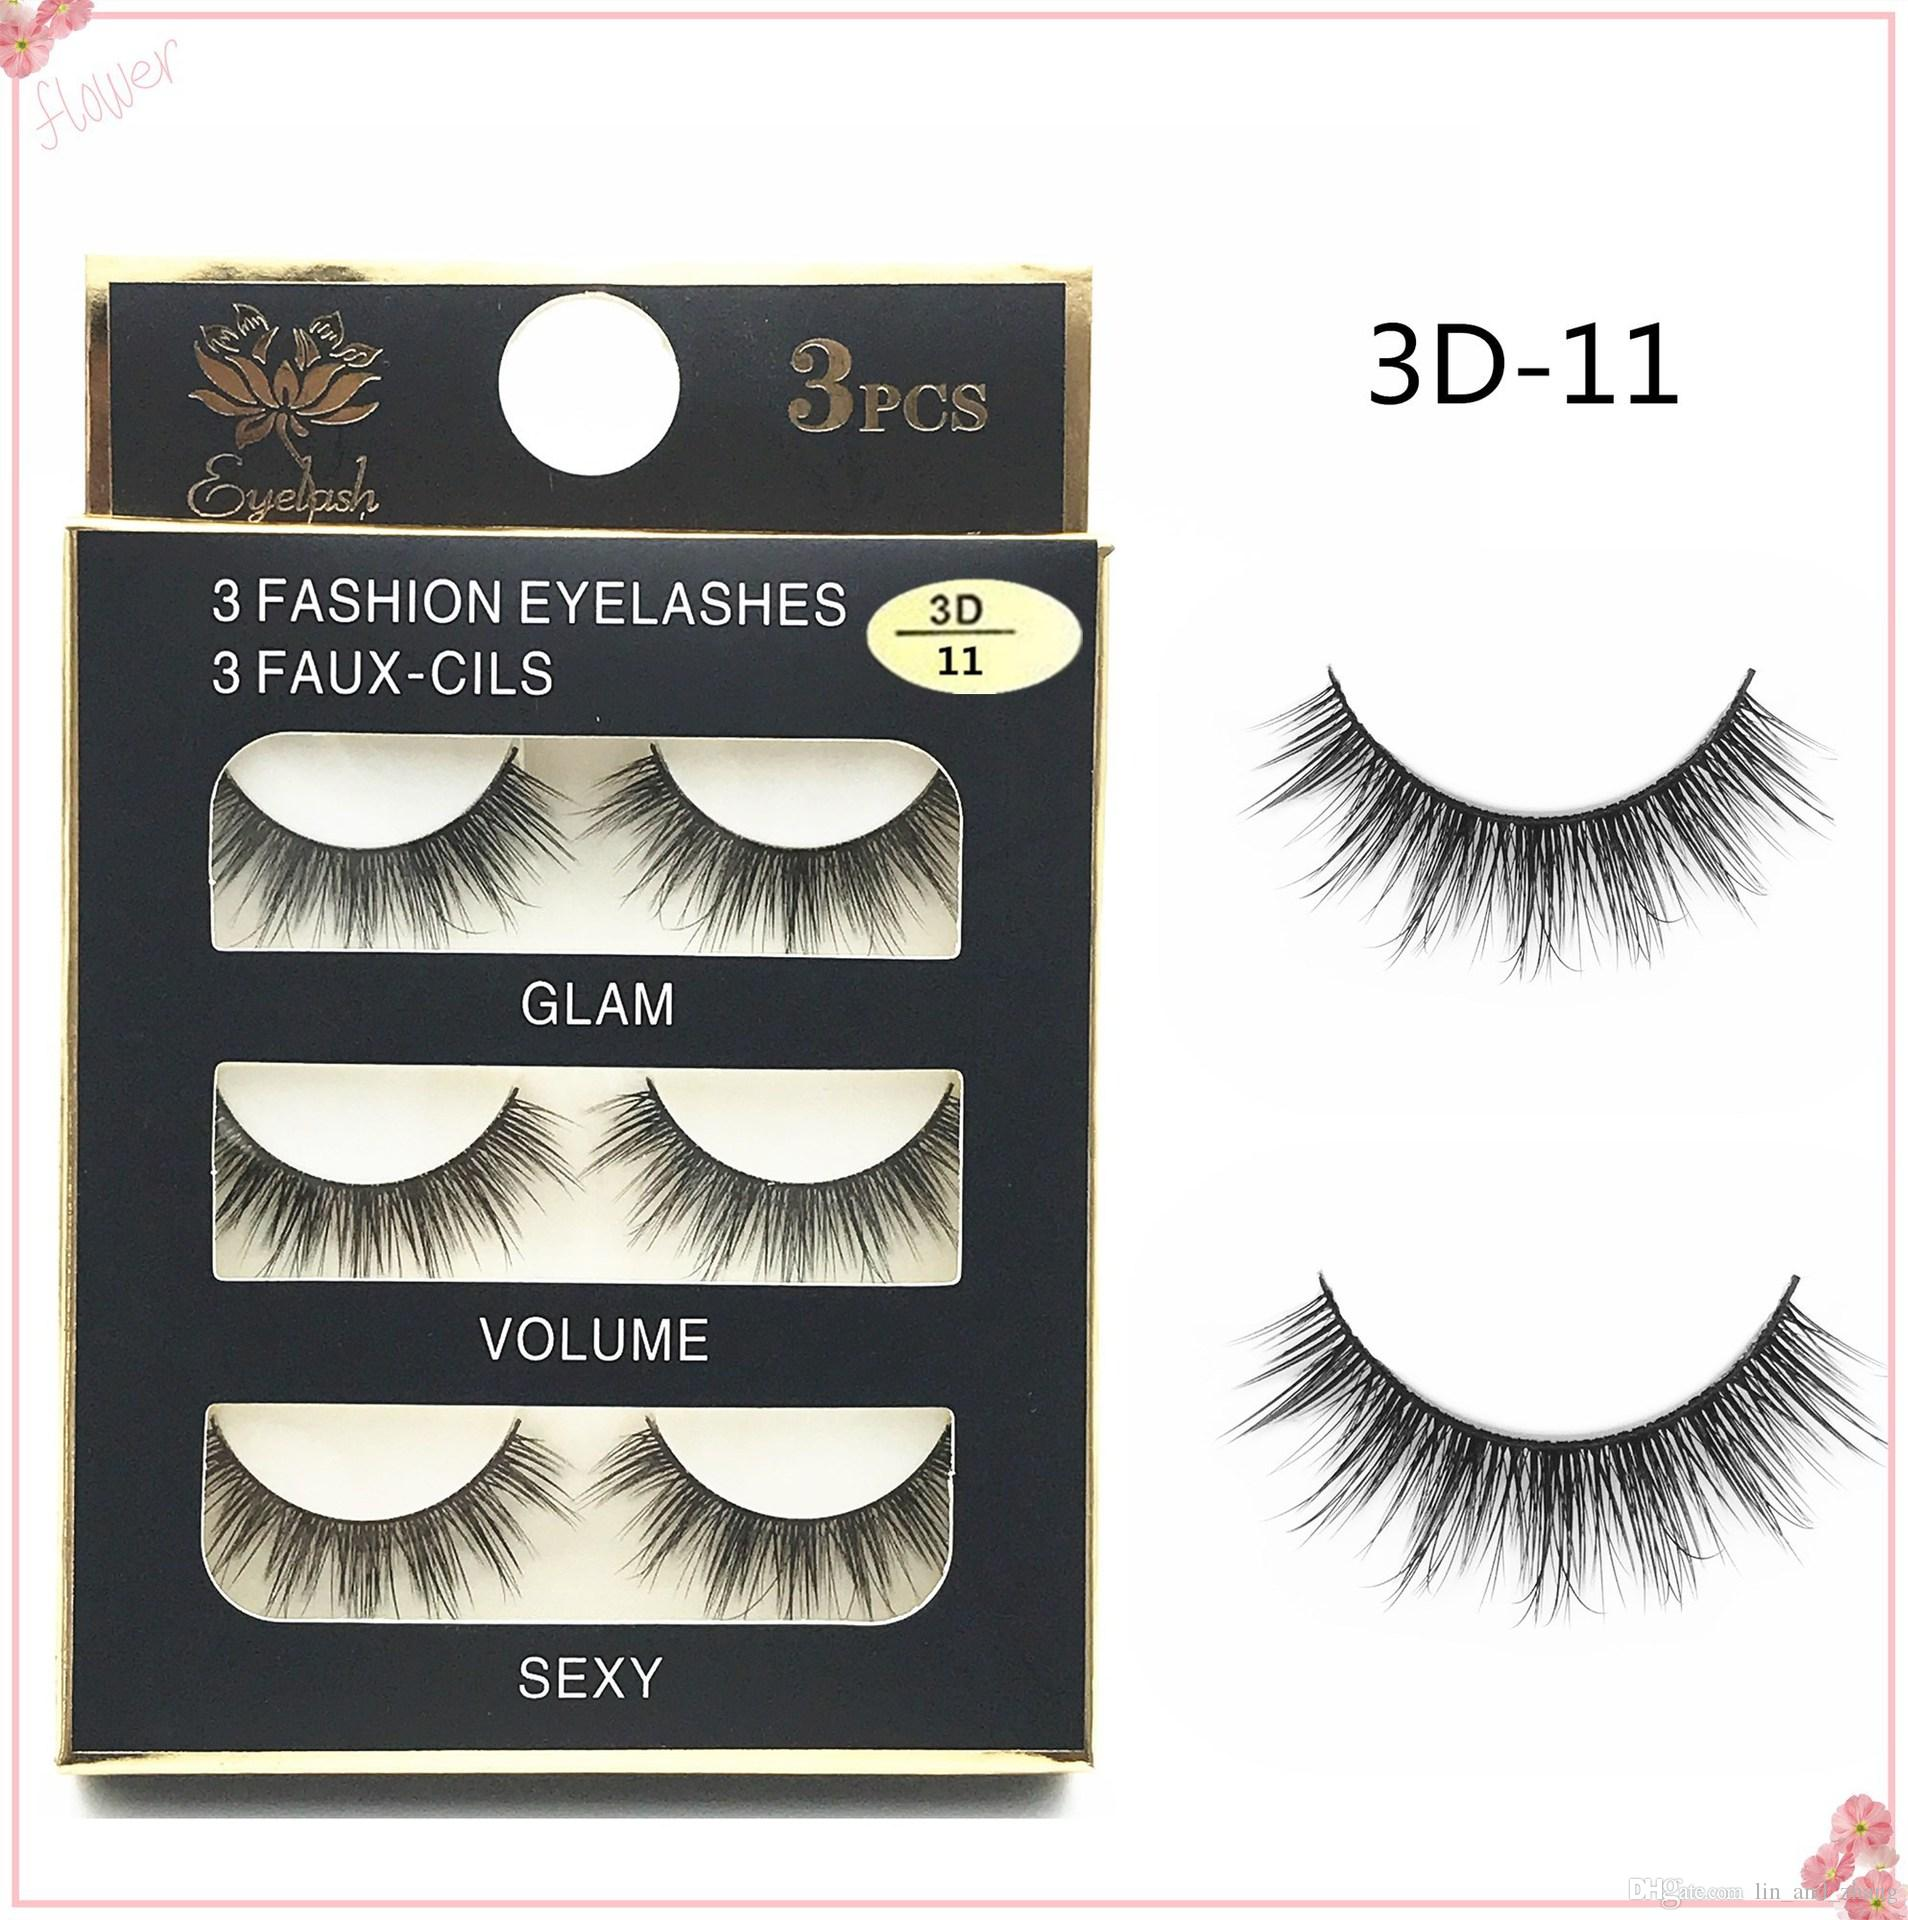 Beauty & Health Long Soft 5 Pairs Mink Hair False Eyelashes Natural Thick Eye Lashes Makeup Extension Tools 2019 Hot 6 Styles Without Return False Eyelashes